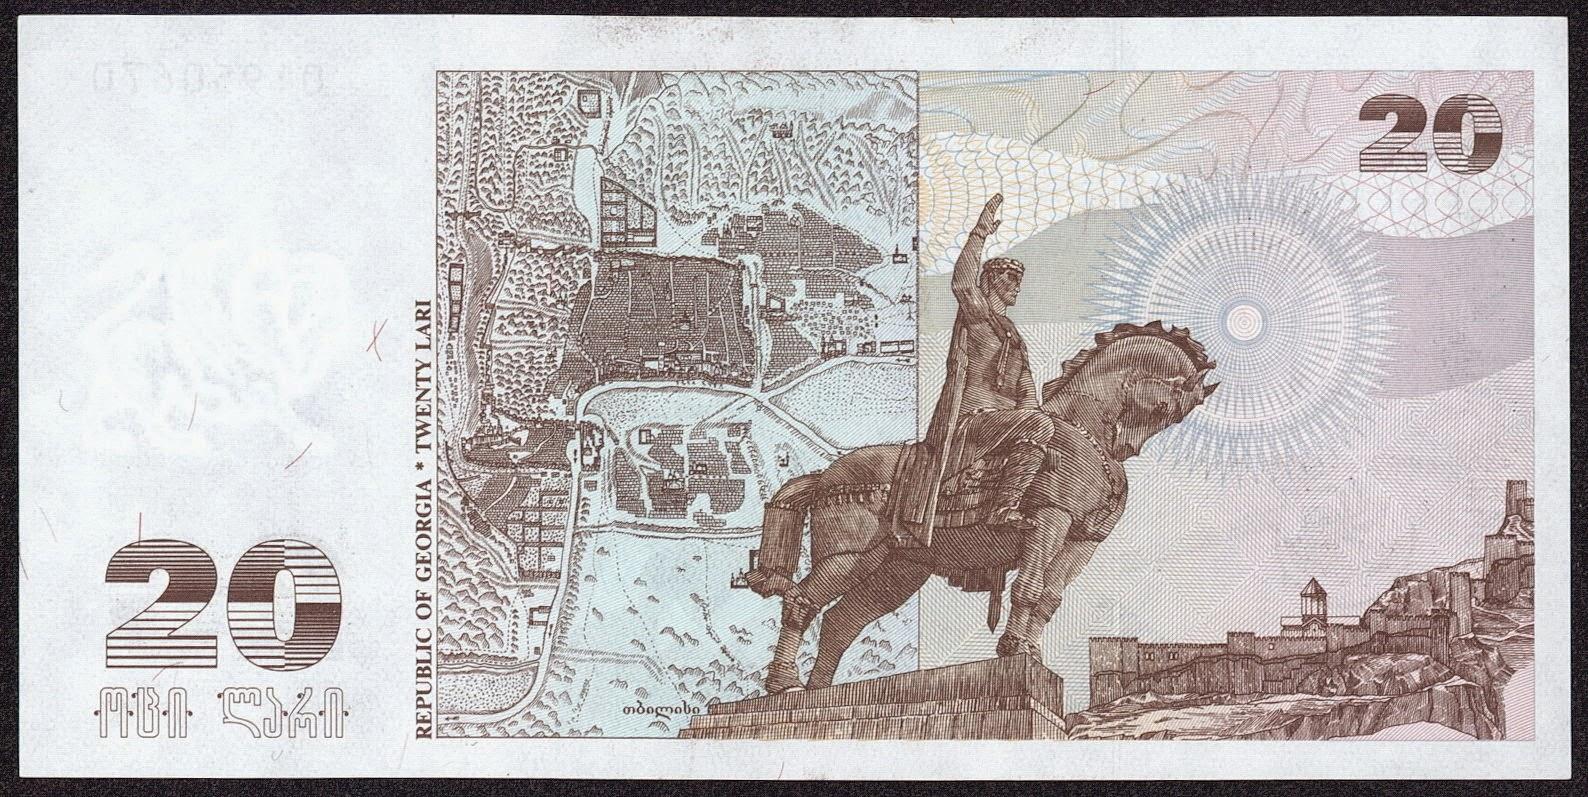 Georgia banknotes 20 Lari note